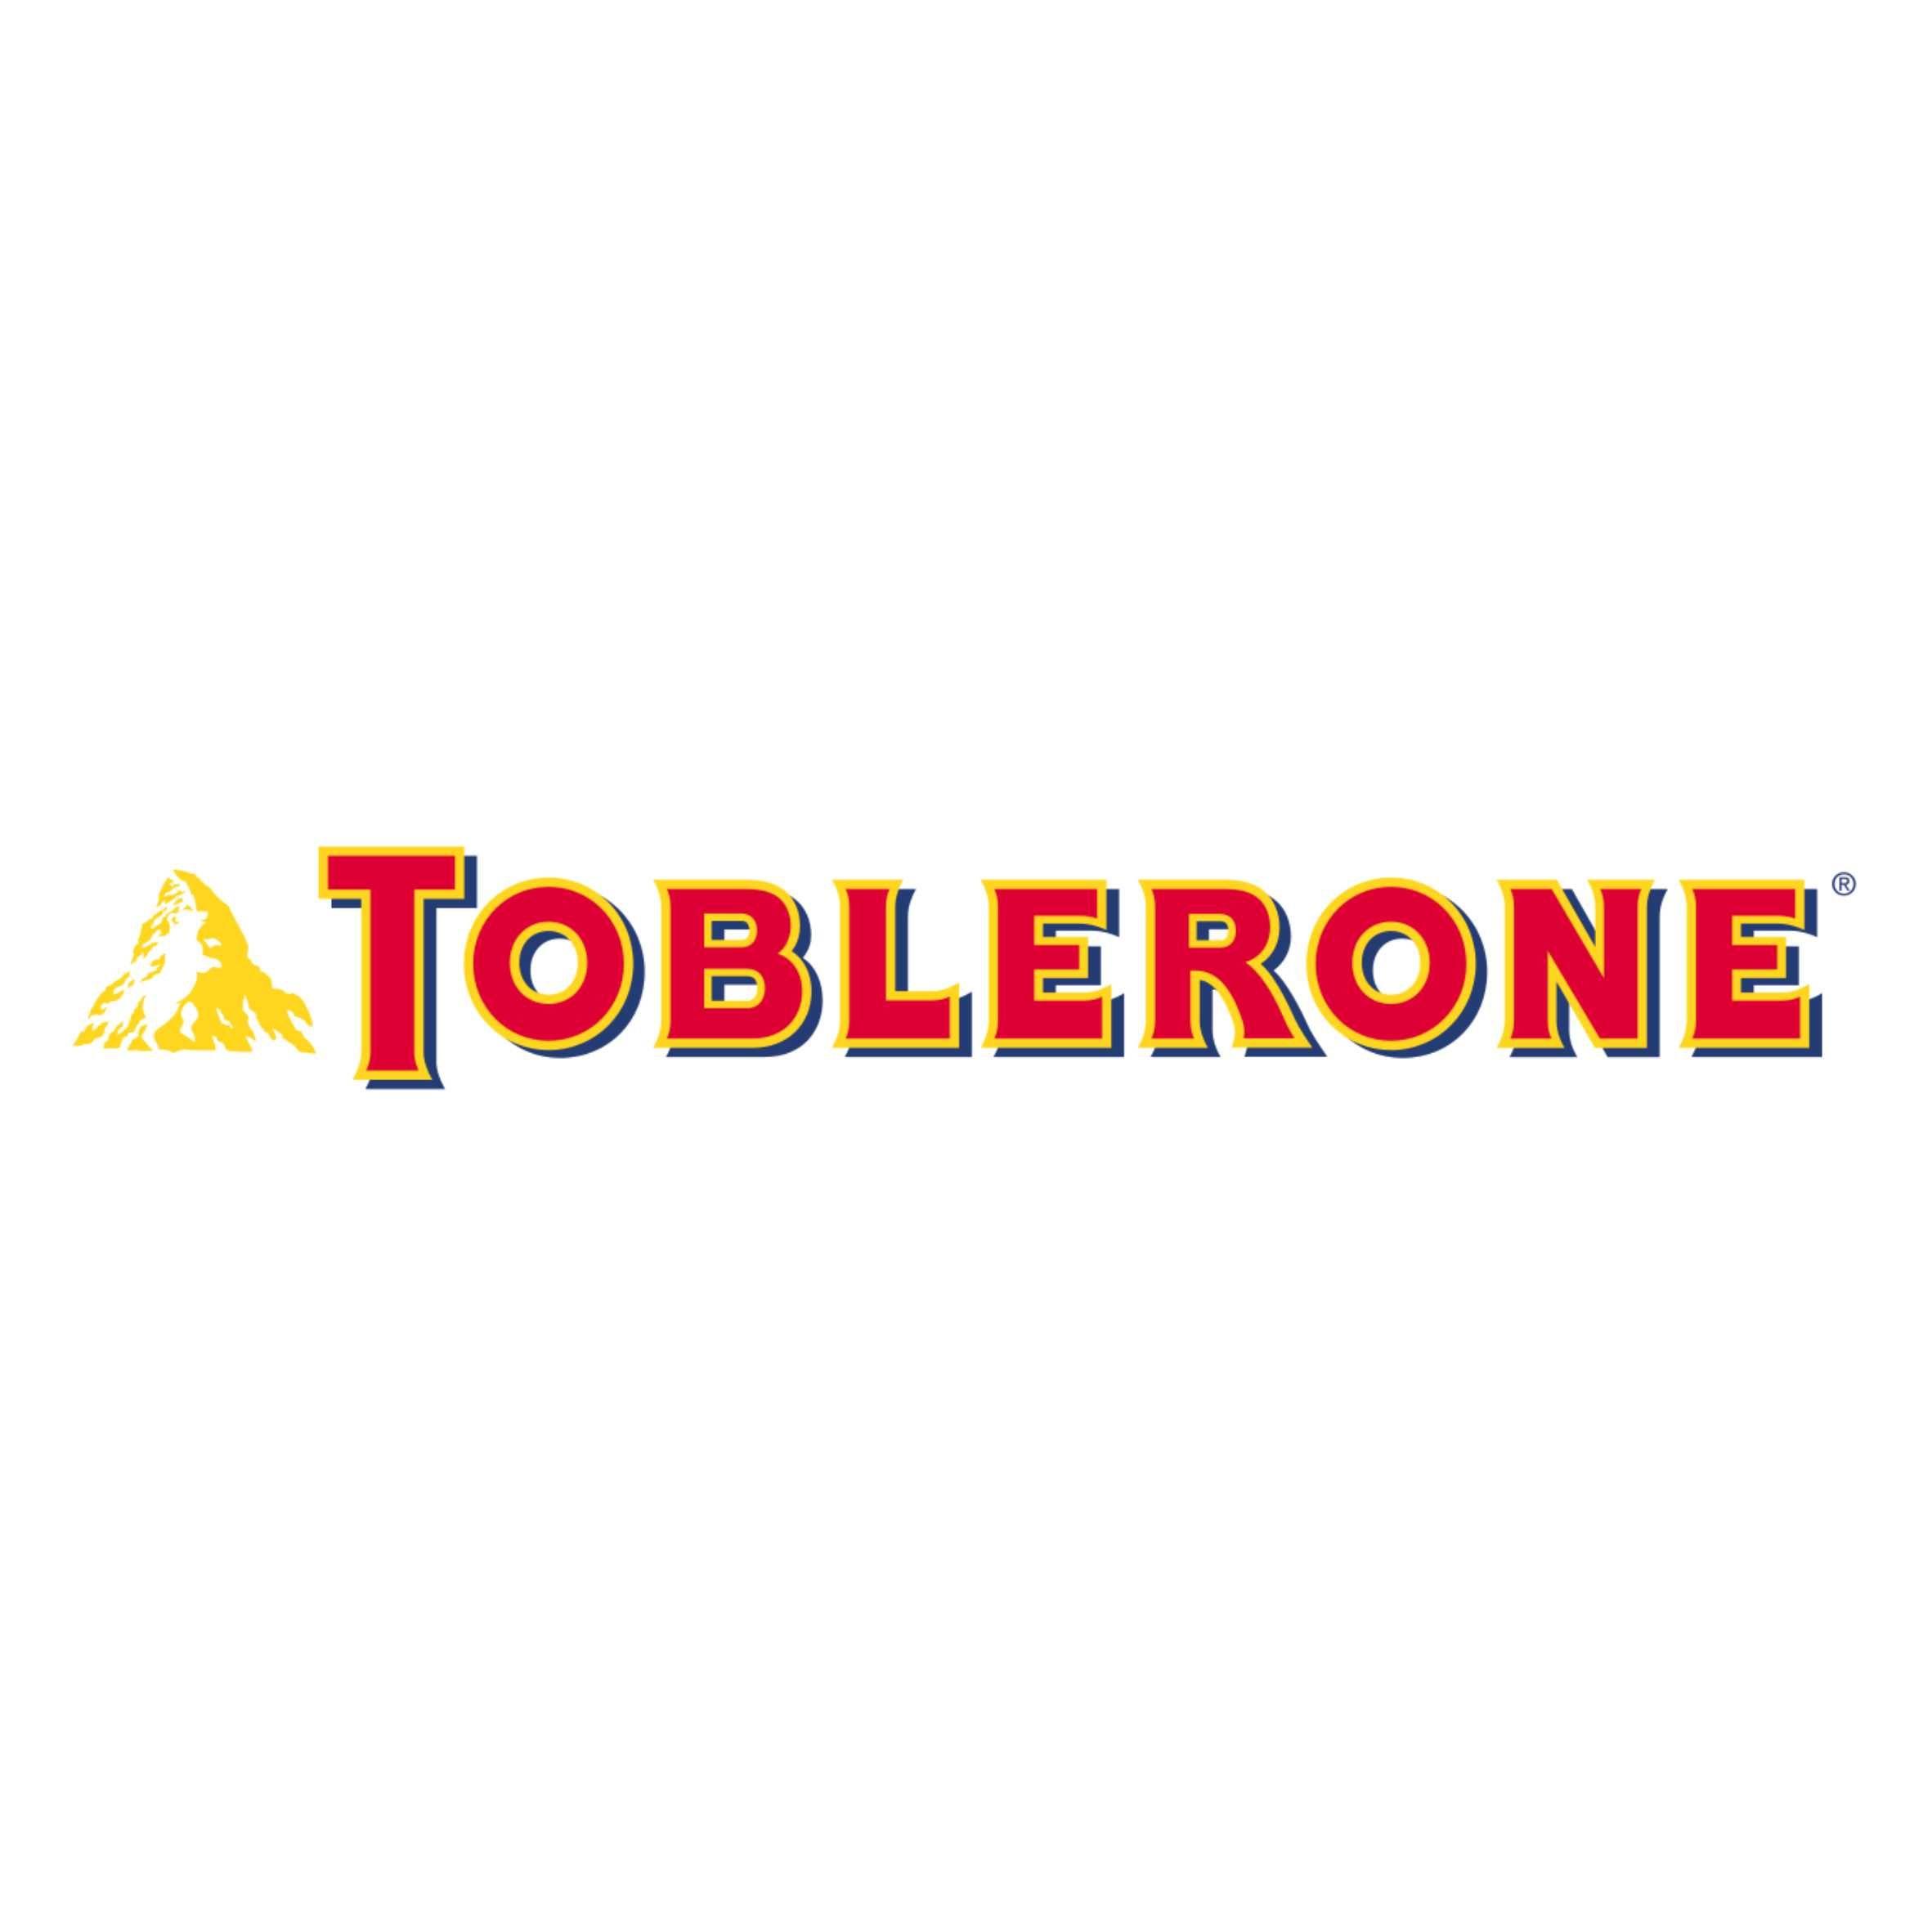 Toblerone®